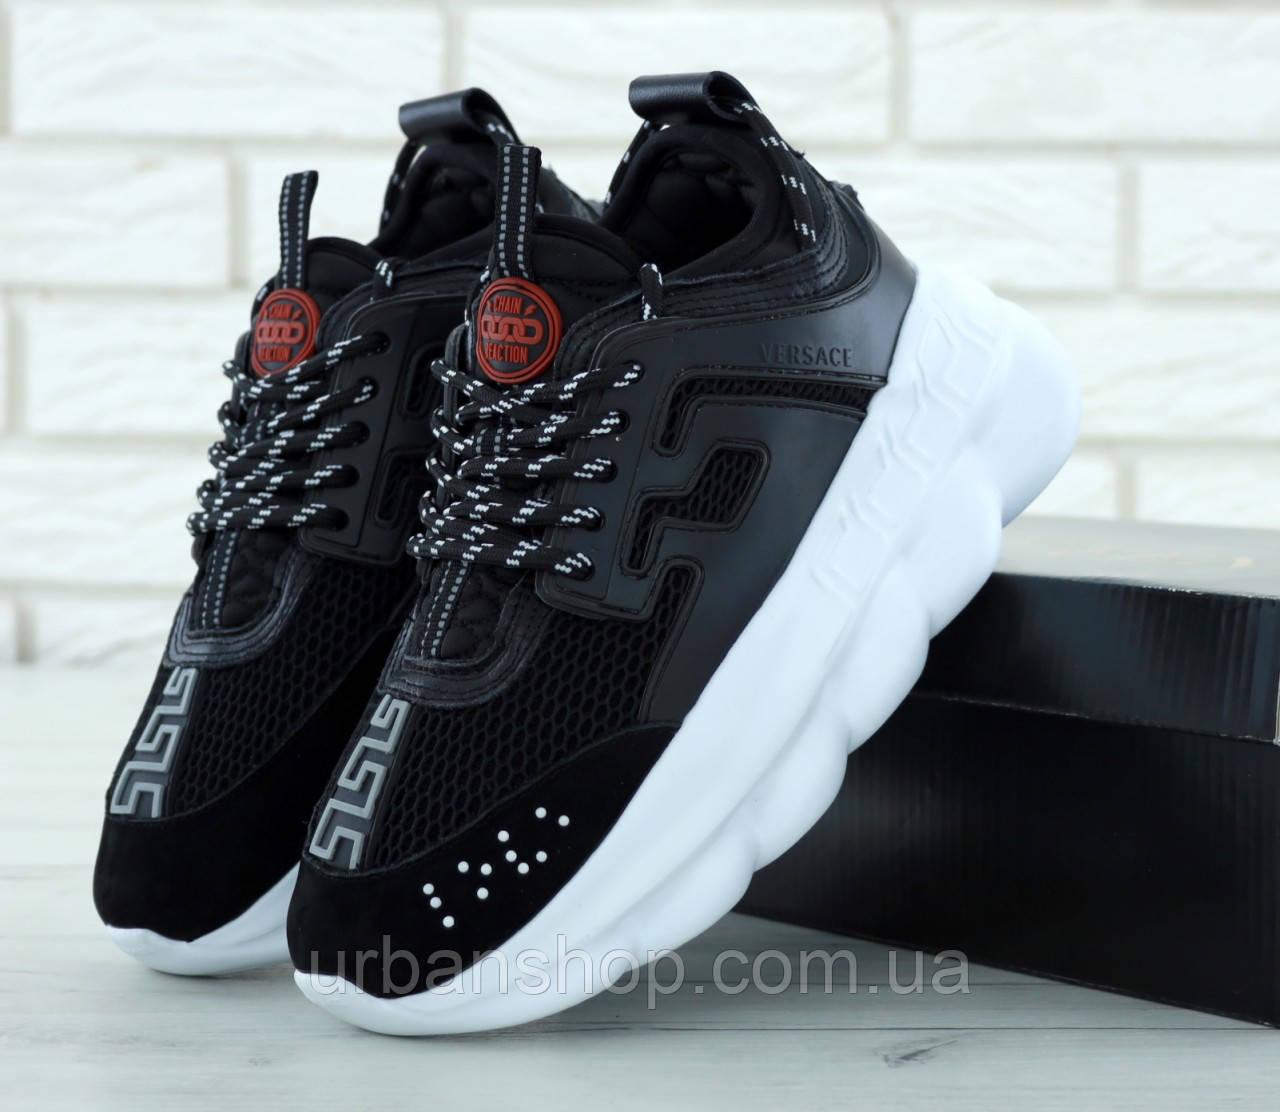 Чоловічі кросівки версаче, Versace Chain Reaction Sneakers Black. ТОП Репліка ААА класу.